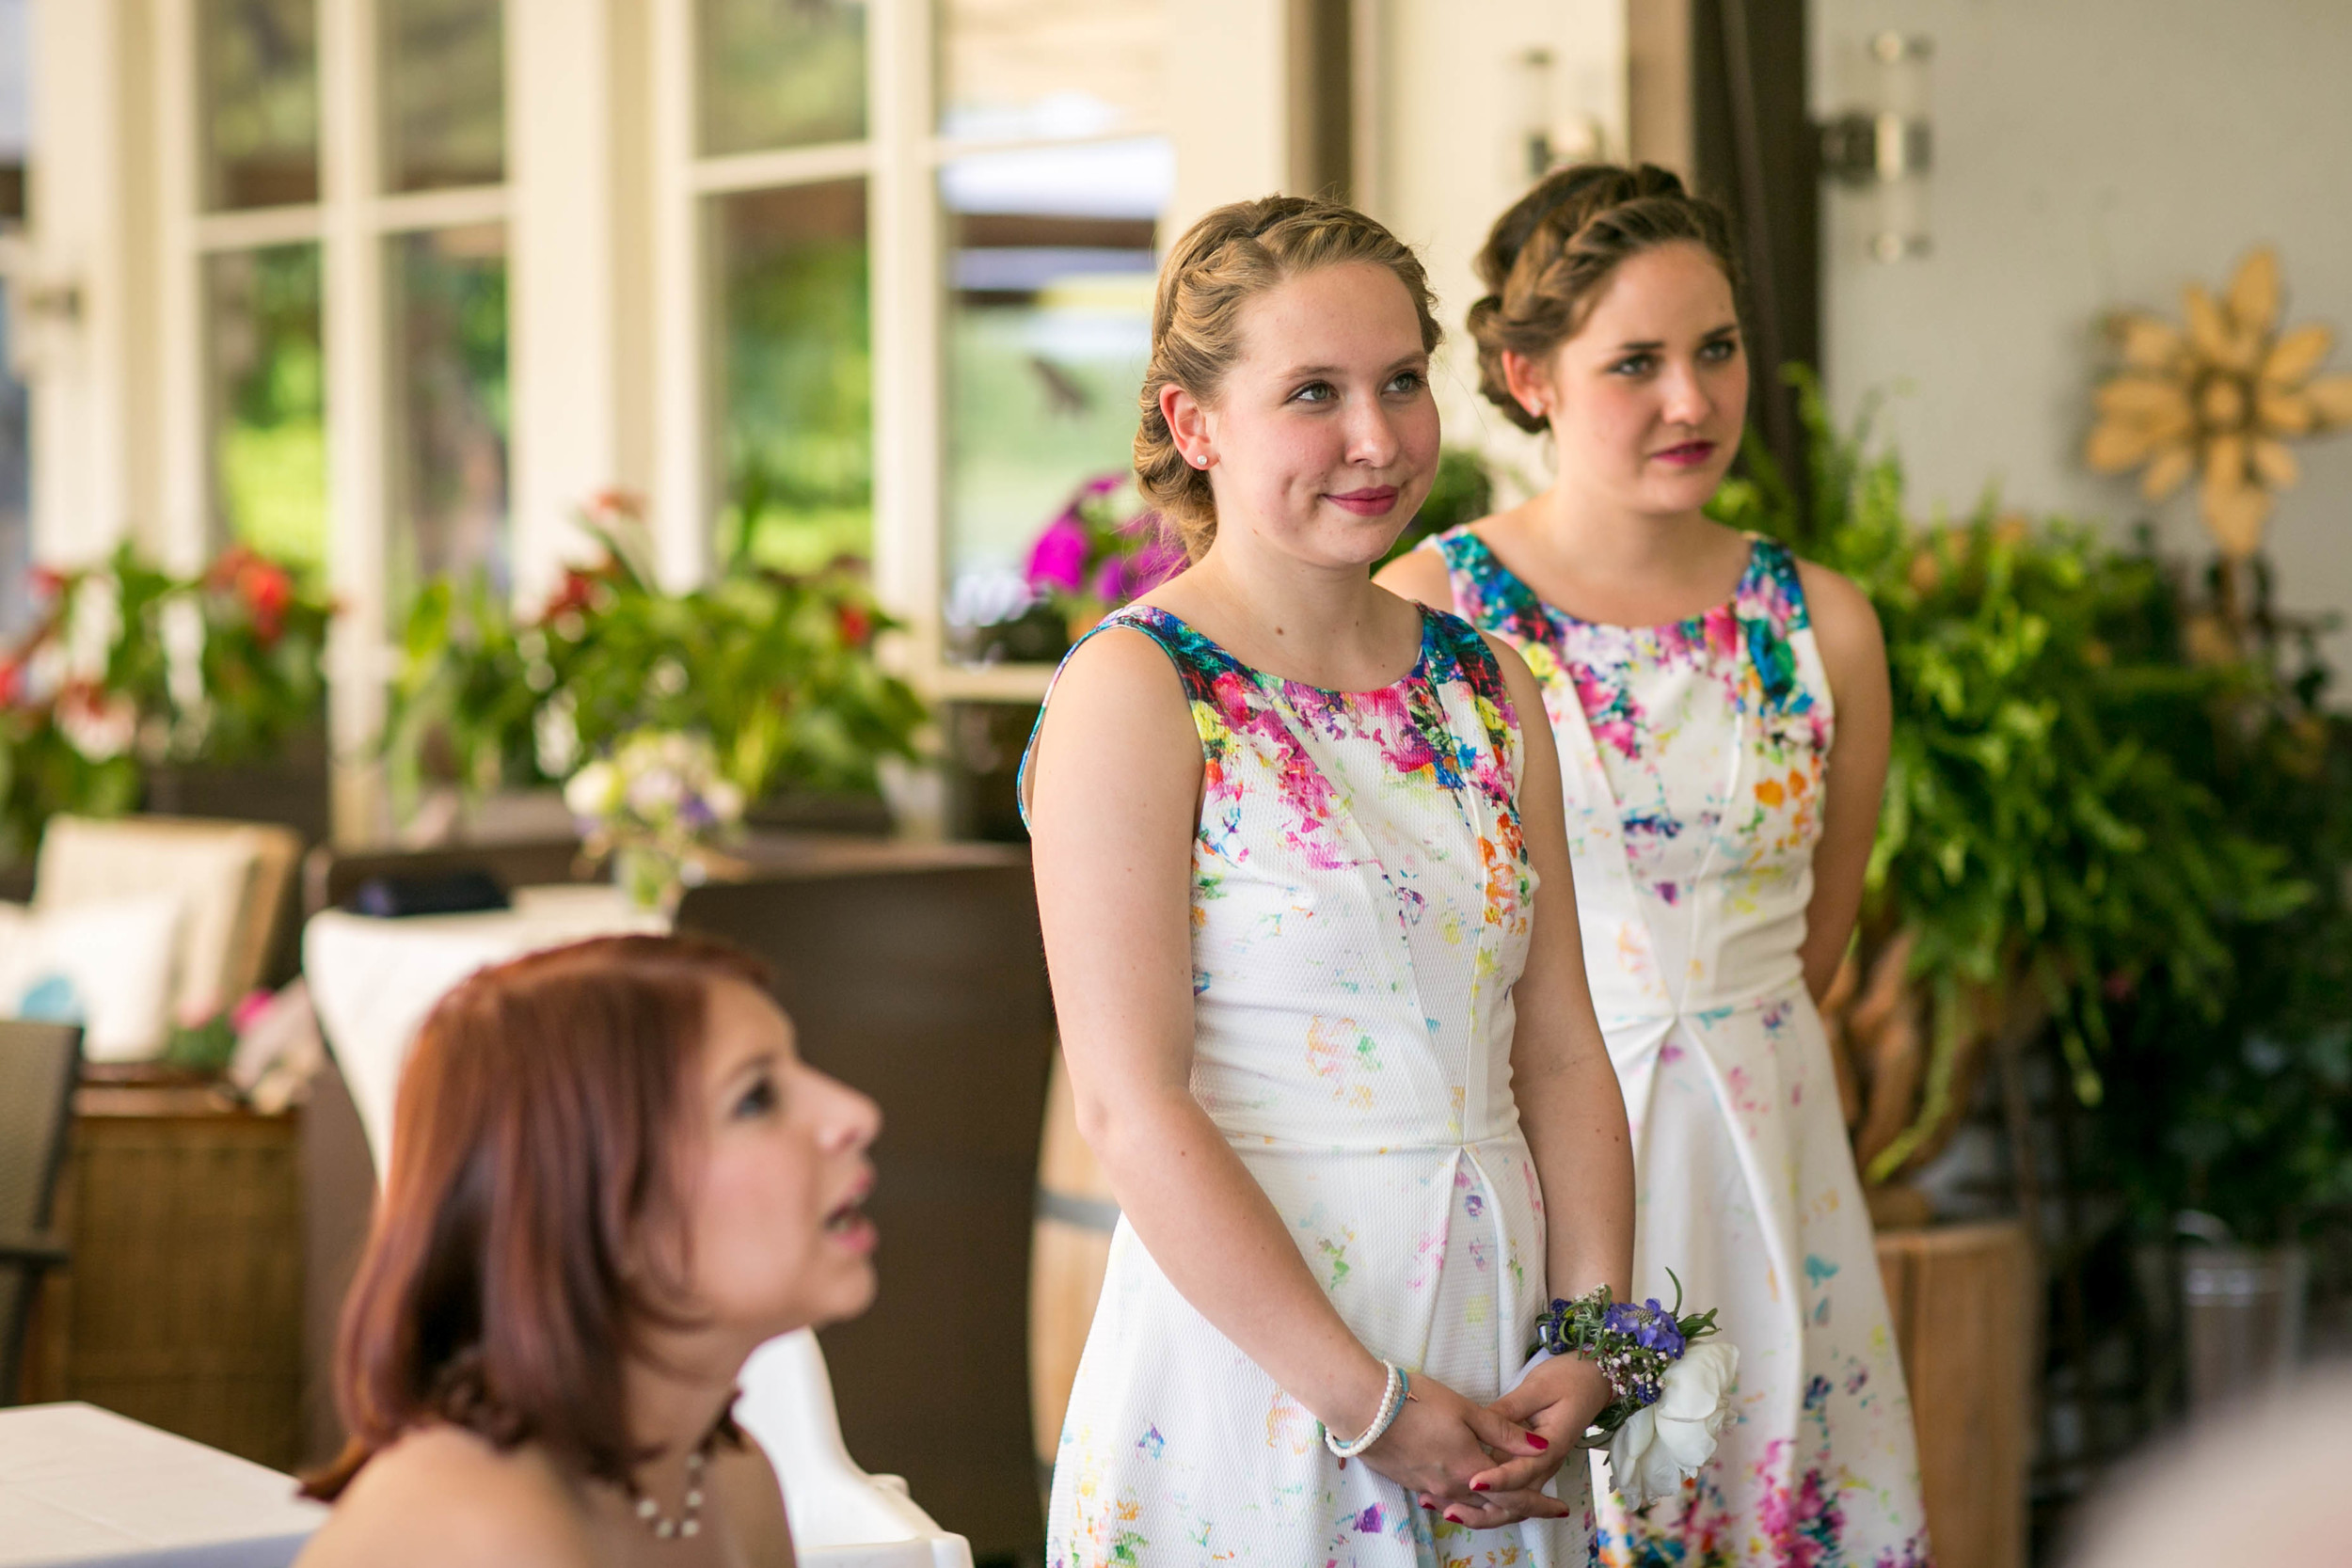 Hochzeitsfotografie Berlin_Fran Burrows Fotografie-304.jpg